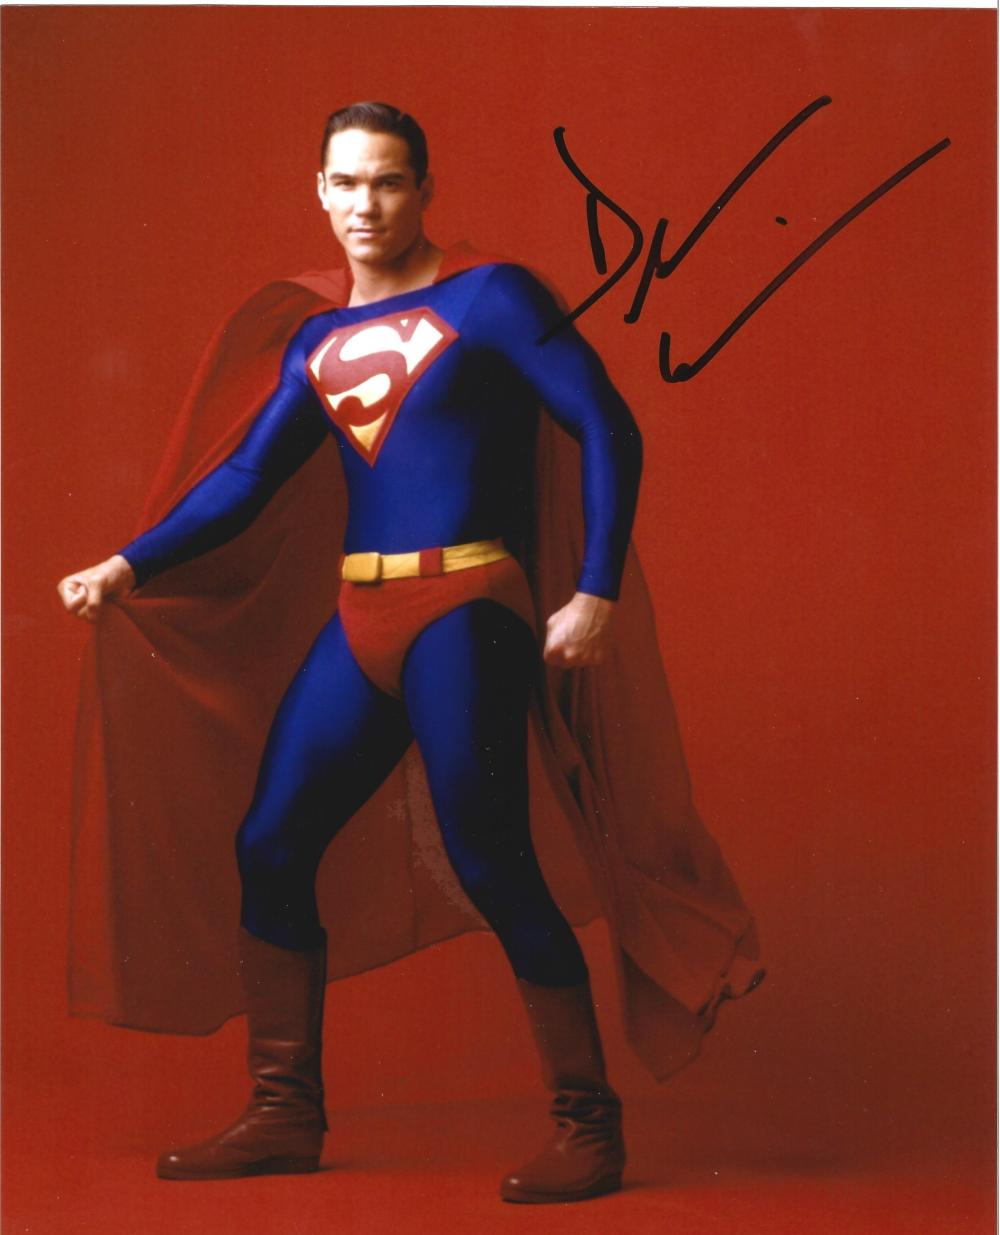 Dean Cain signed 10x8 colour Superman photo. Dean George Cain (born July 31, 1966) is an American